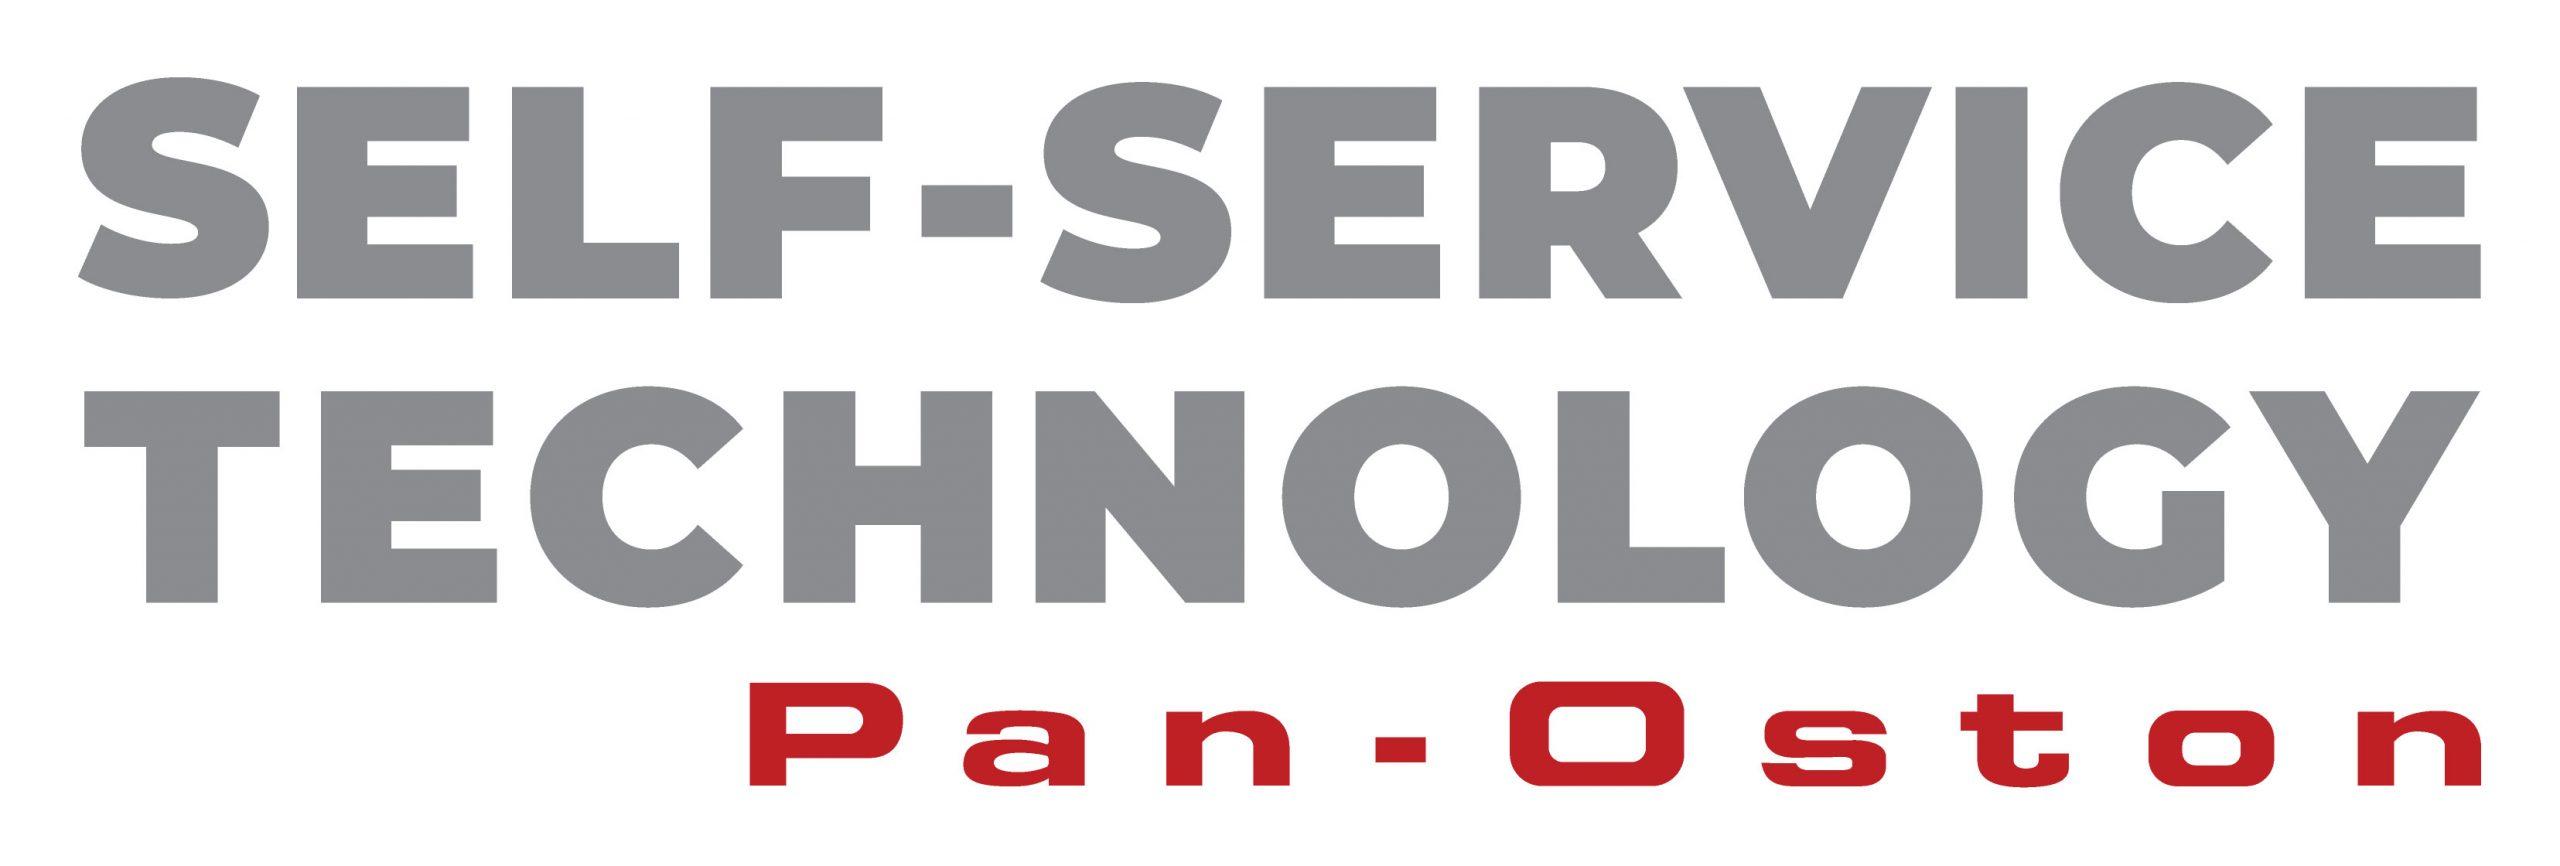 Pan-Oston Self-Service Technology Case Study Thumbnail